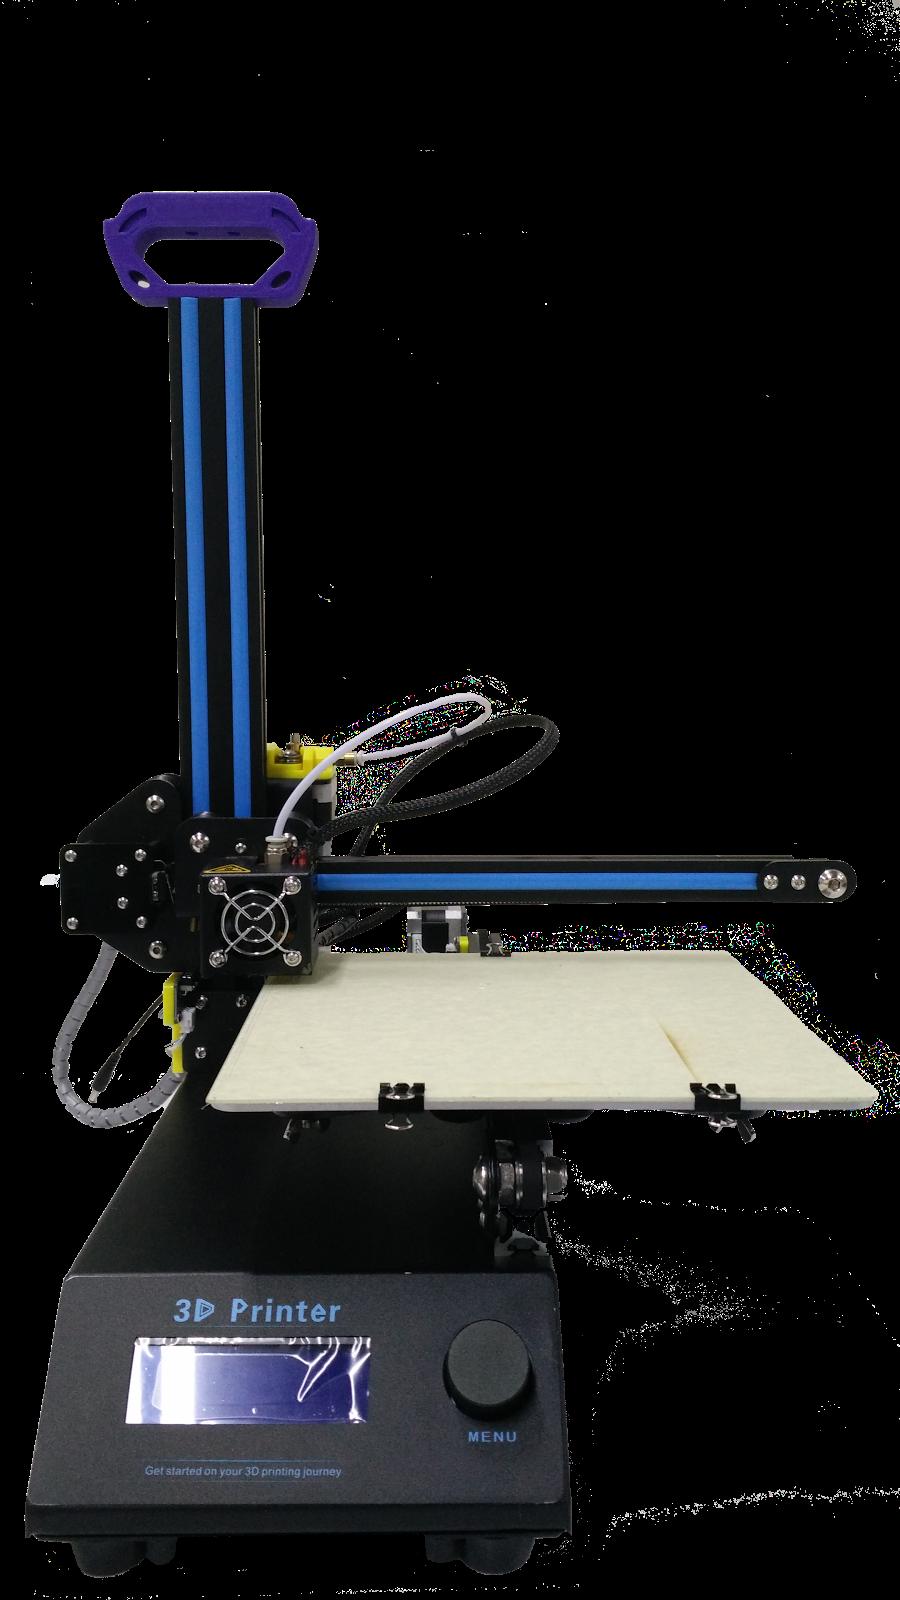 3D Printing Robotics: Personal 3D Printer Creality CR8